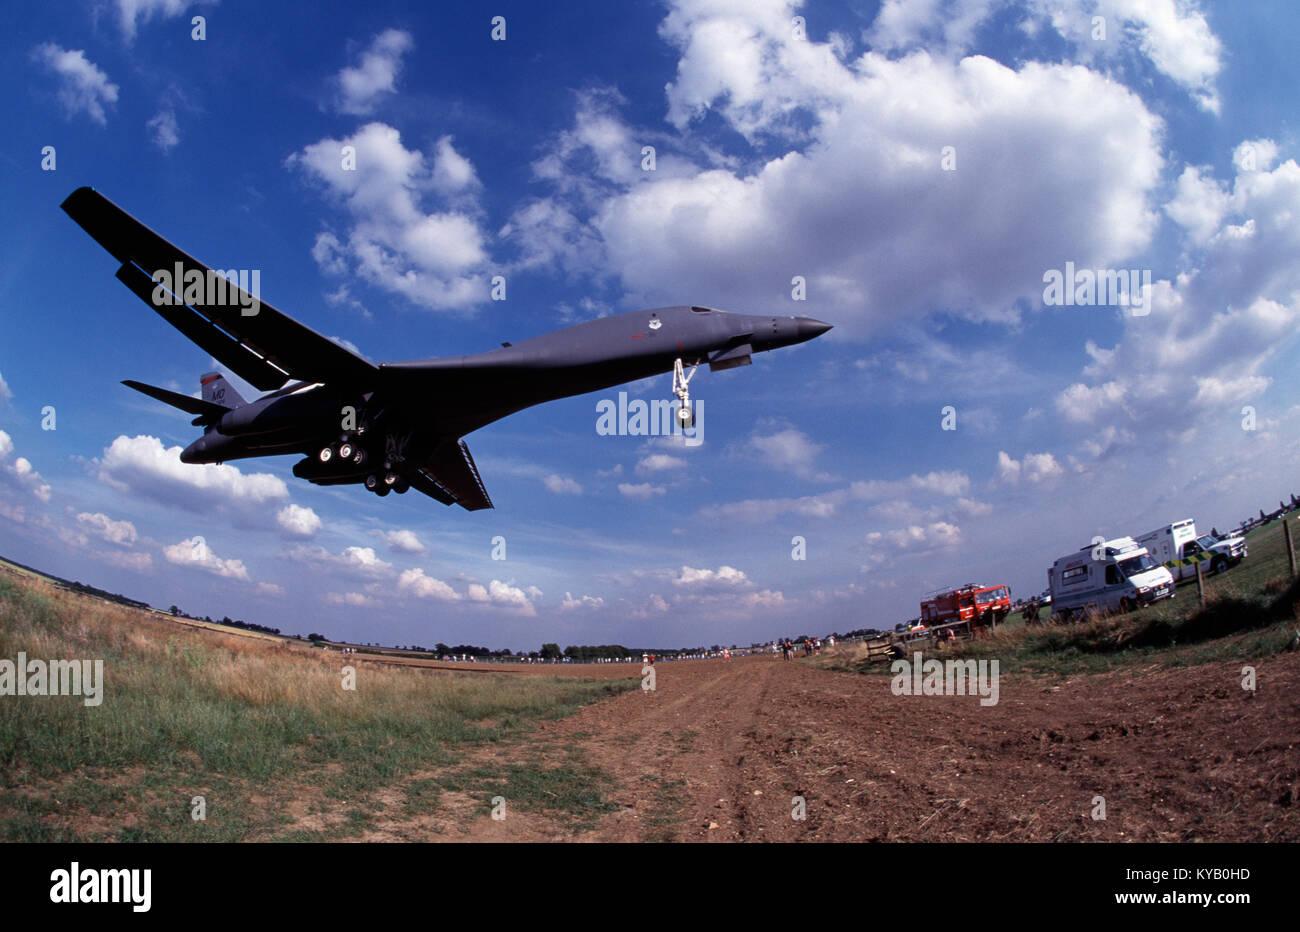 USAF B1 Bomber on final approach at Cottesmore, Rutland, England, U.K. - Stock Image